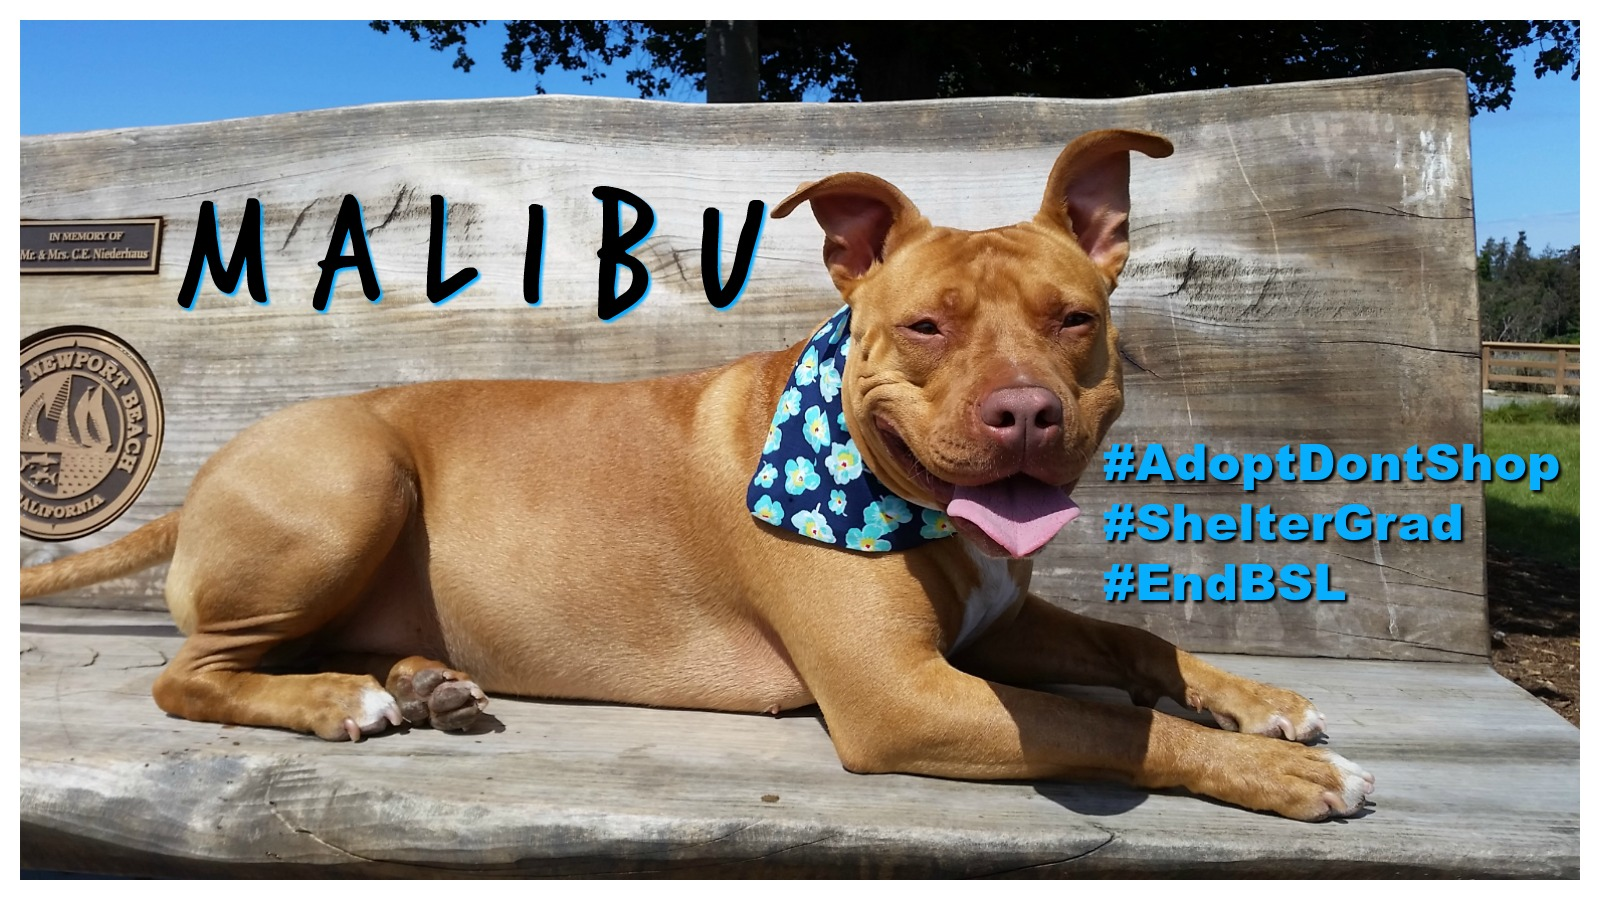 Malibu Featured